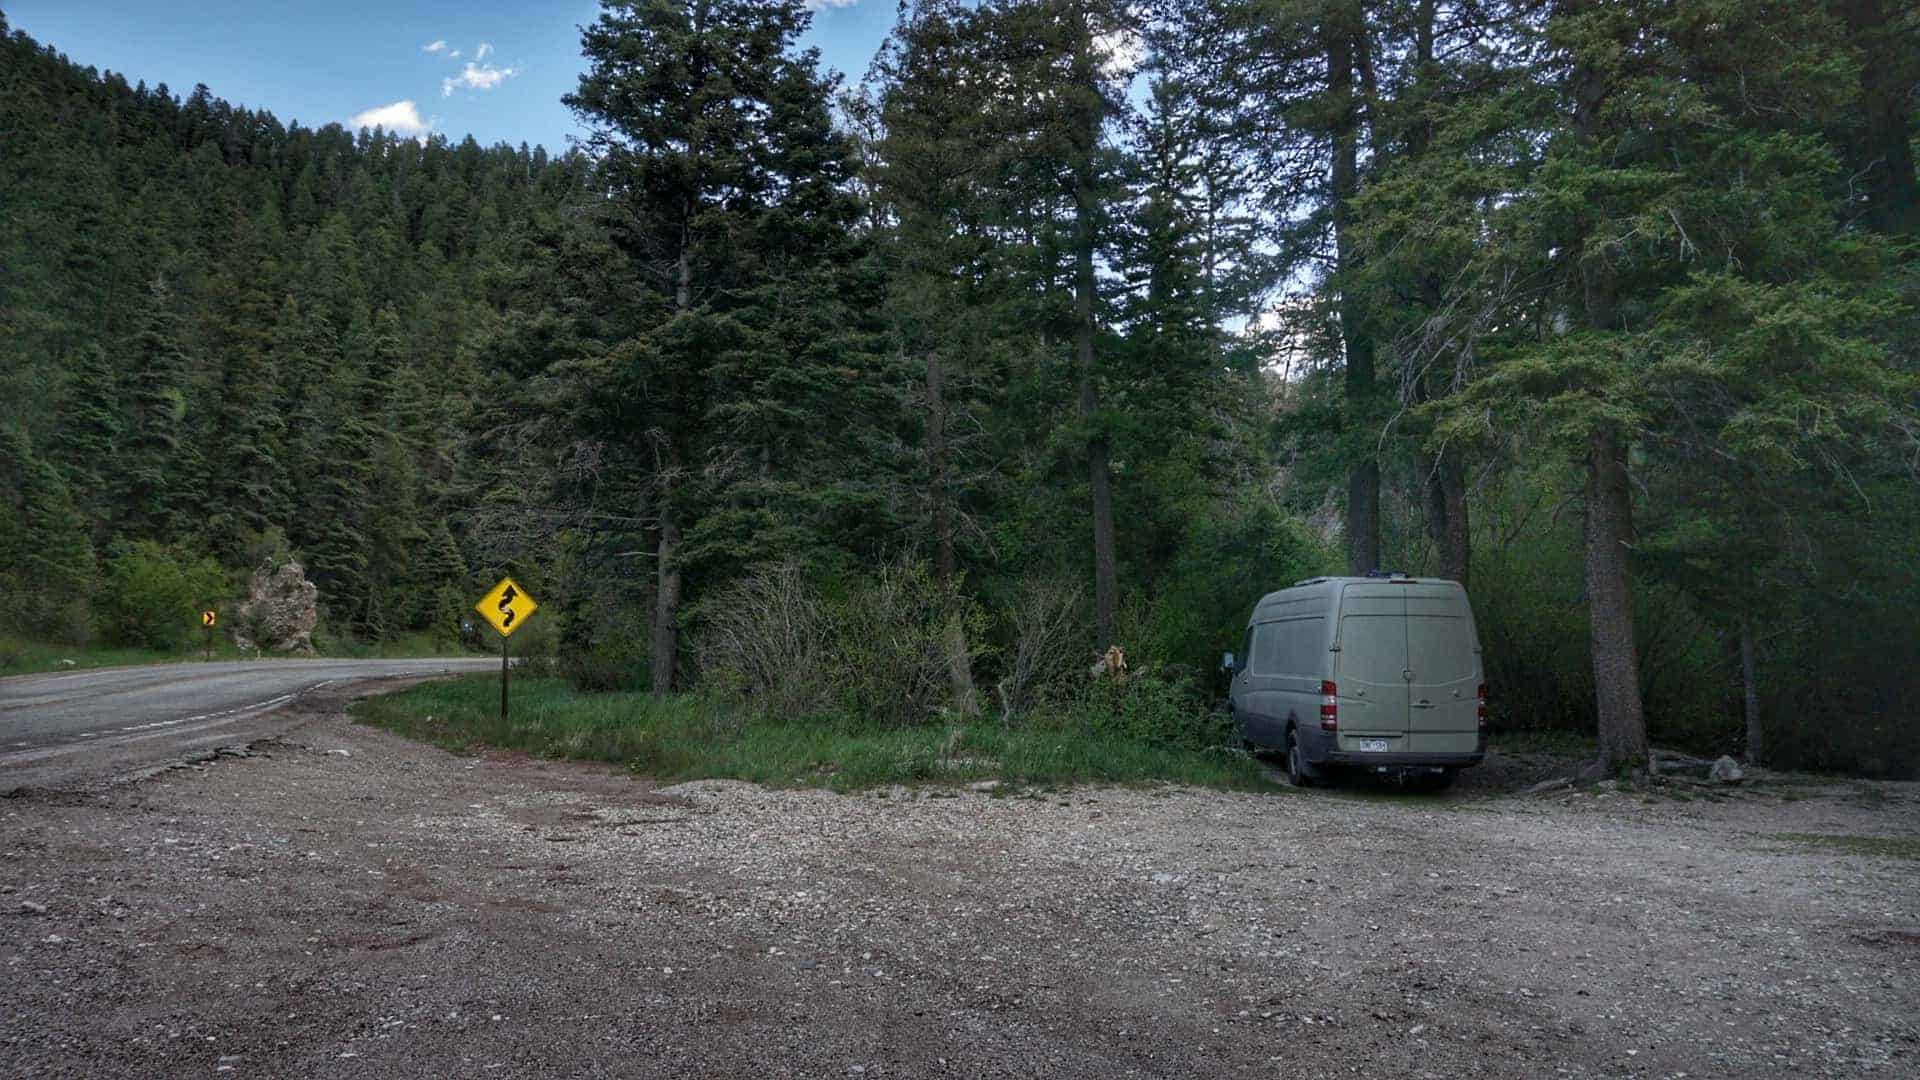 Boondocking-Campsite-Taos-Ski-Valley-2